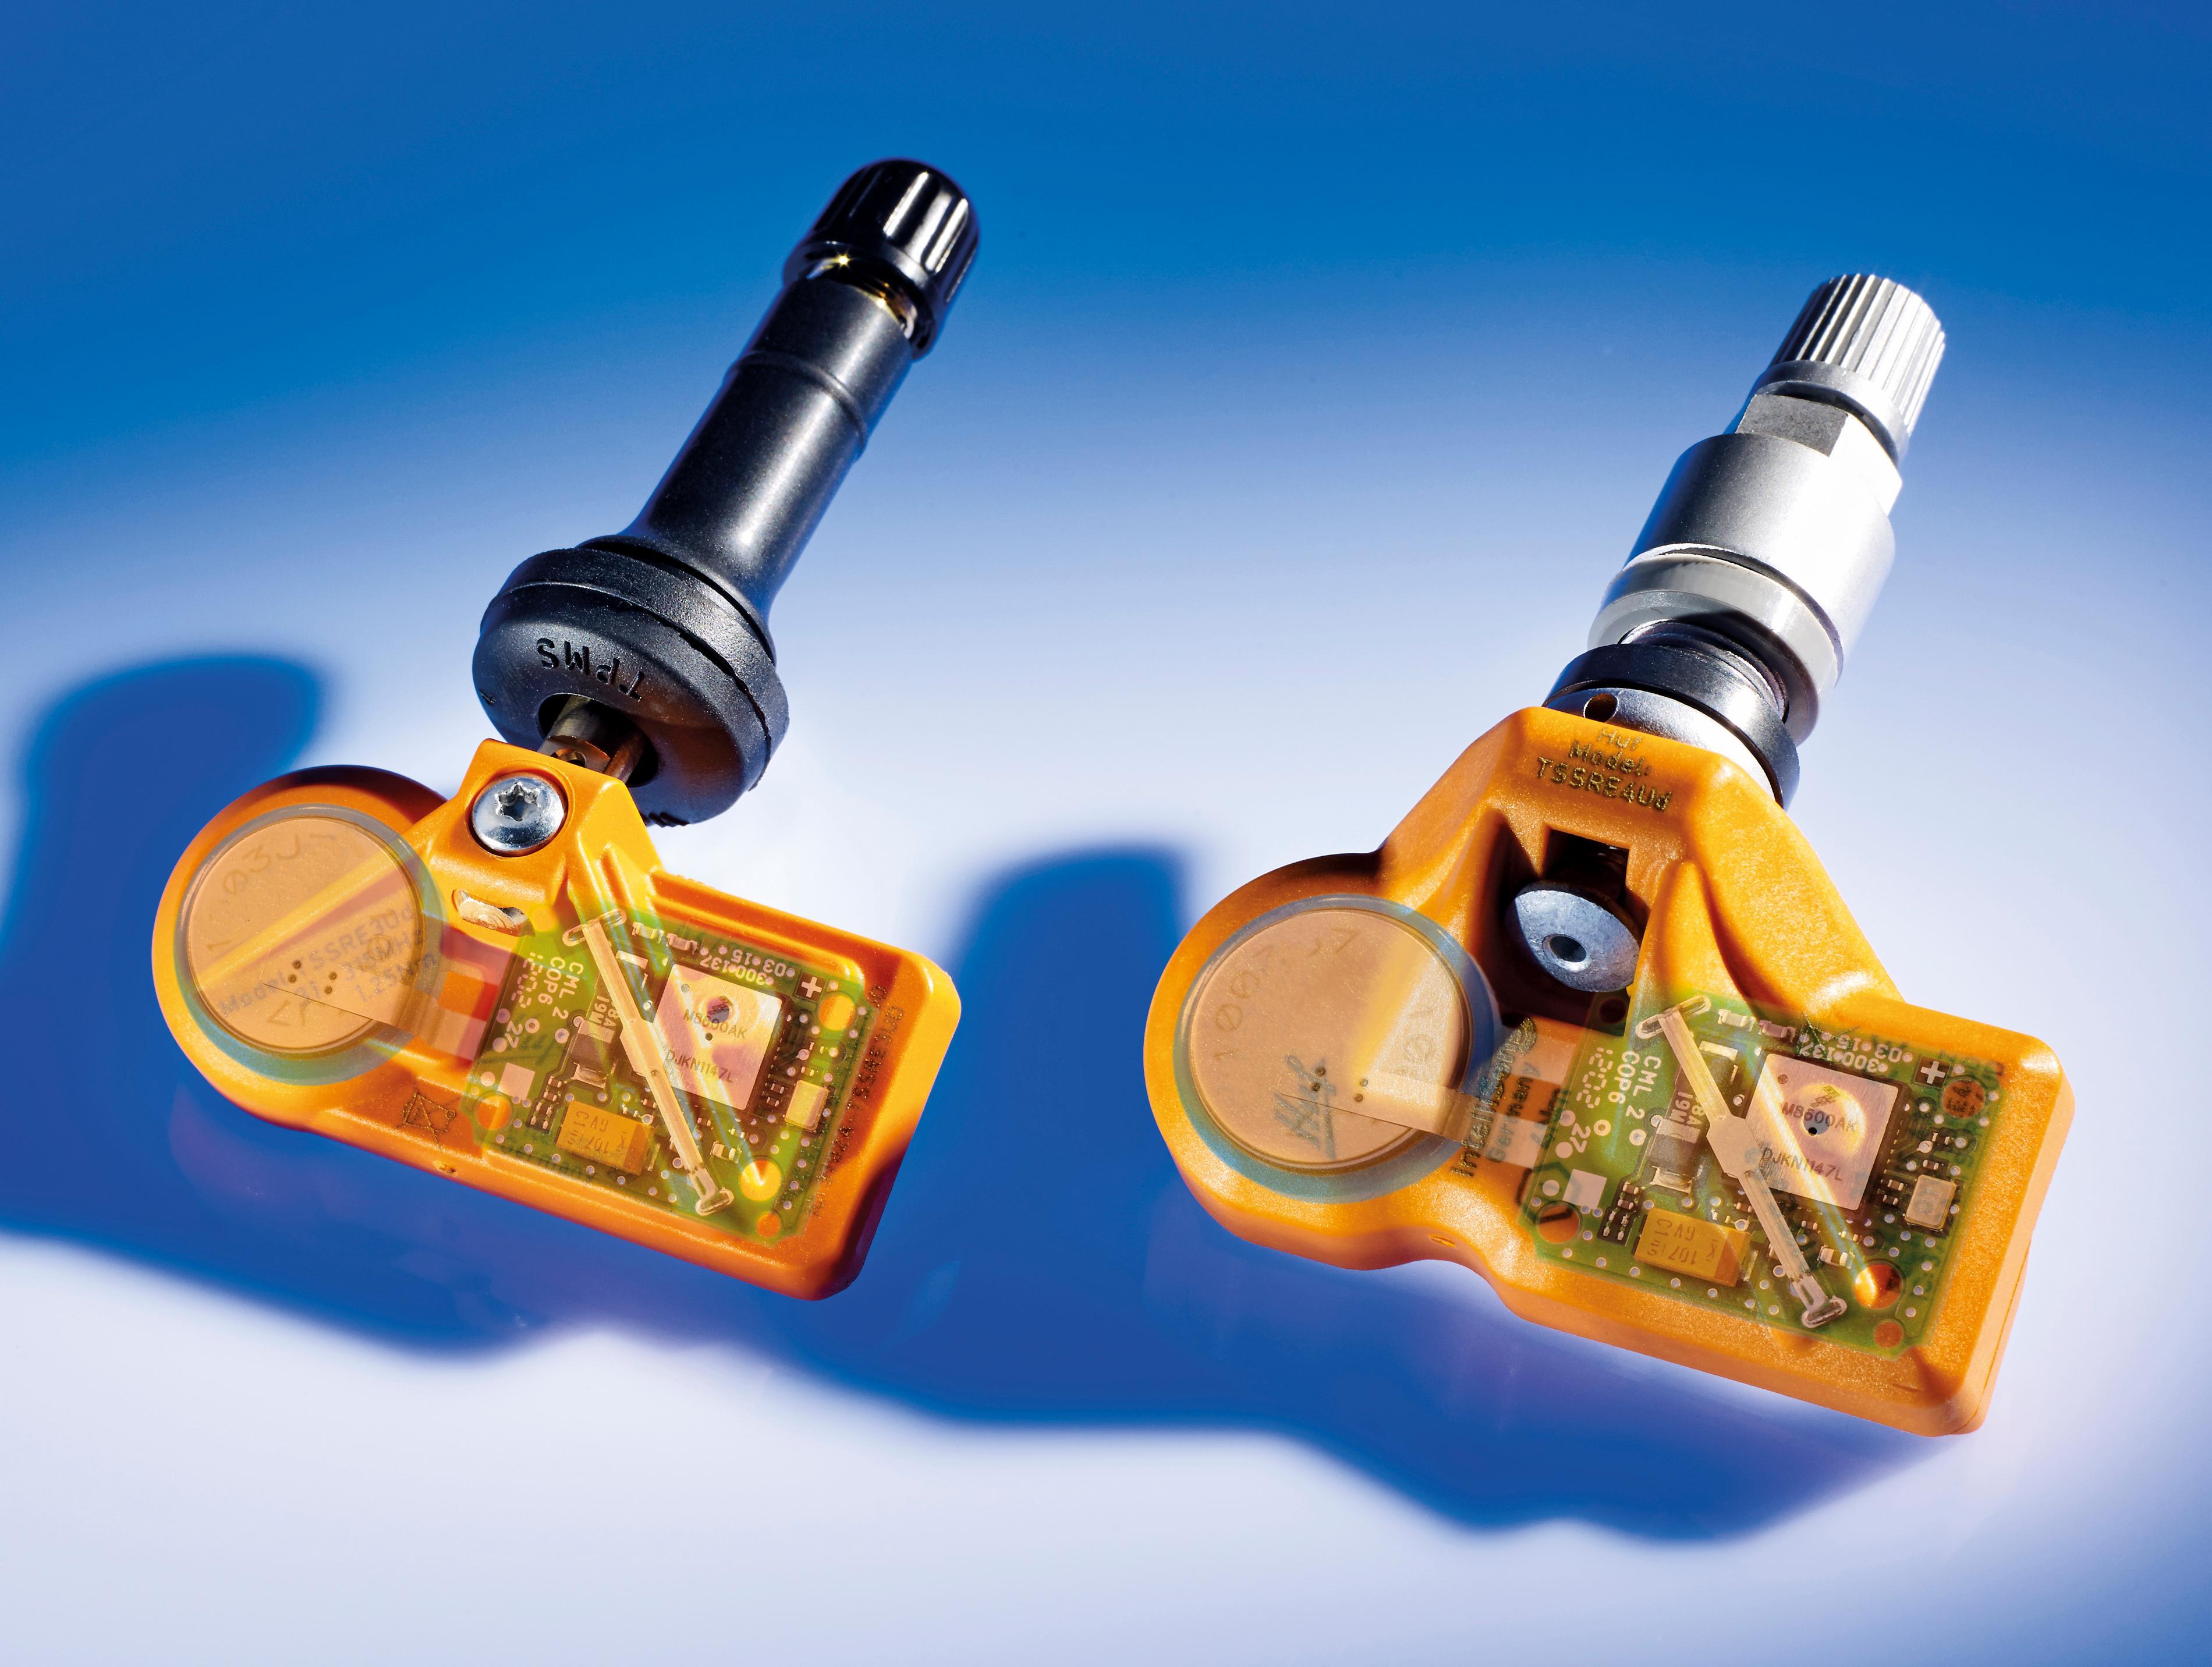 Tire Pressure Monitoring System (TPMS) HUF North America UVS4031 IntelliSens 433MHz Universal TPMS Sensor Tires & Wheels